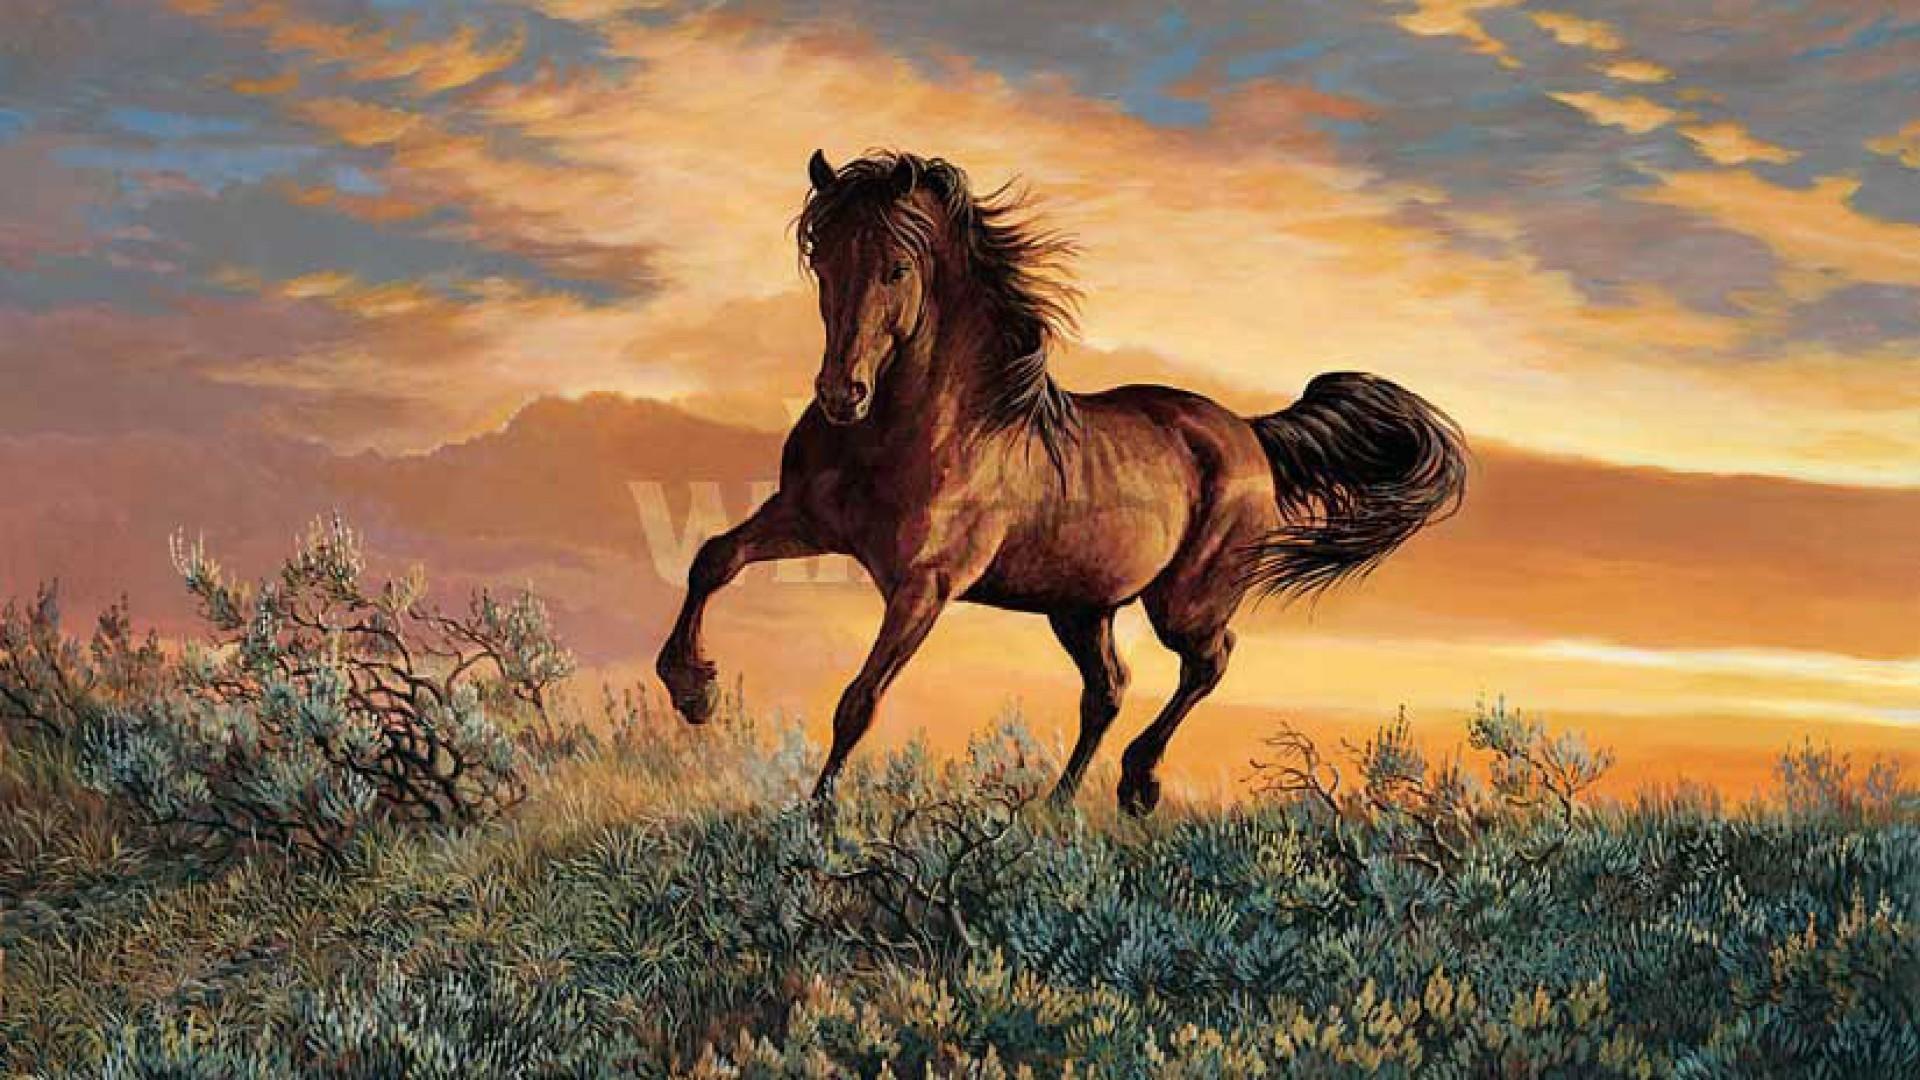 Wild Horses Mustang Data Src Large Wild Horse Wallpaper Wild Horses Wallpaper 3d 1920x1080 Download Hd Wallpaper Wallpapertip